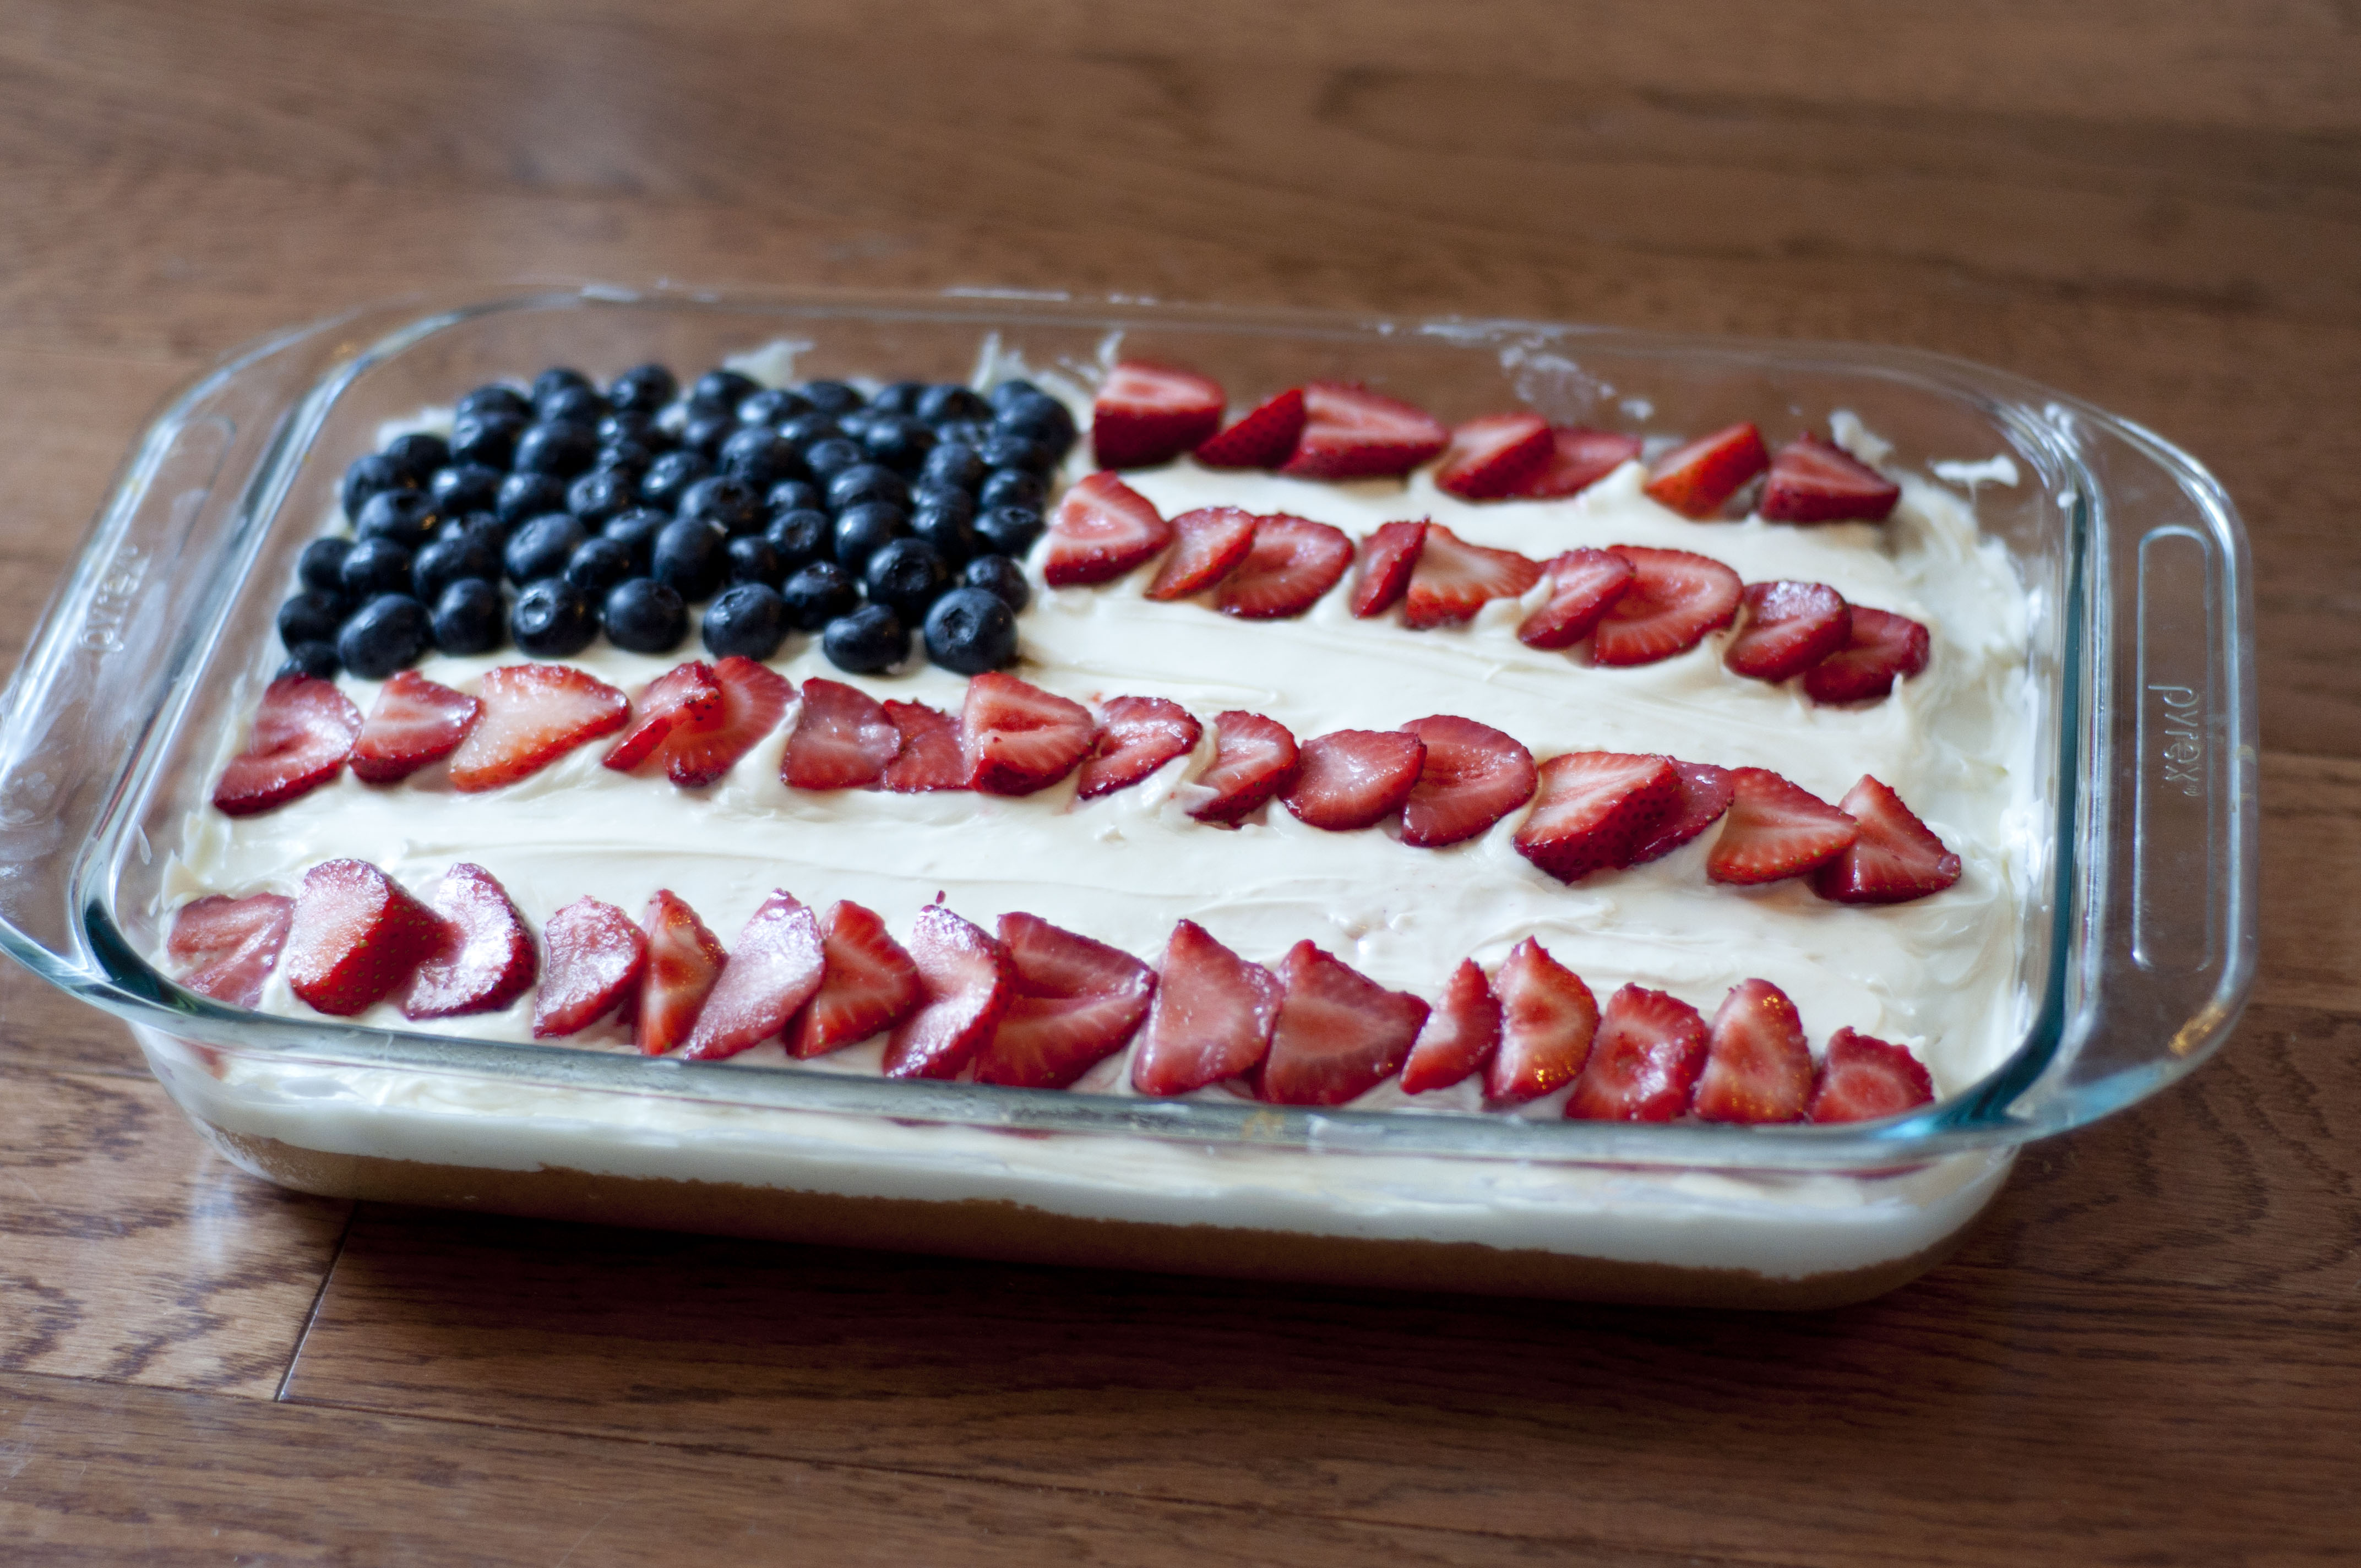 flag cake recipe, easy flag cake, fourth of july flag cake, white cake, fourth of july recipe, easy fourth of july recipe, food, cooking, taste arkansas